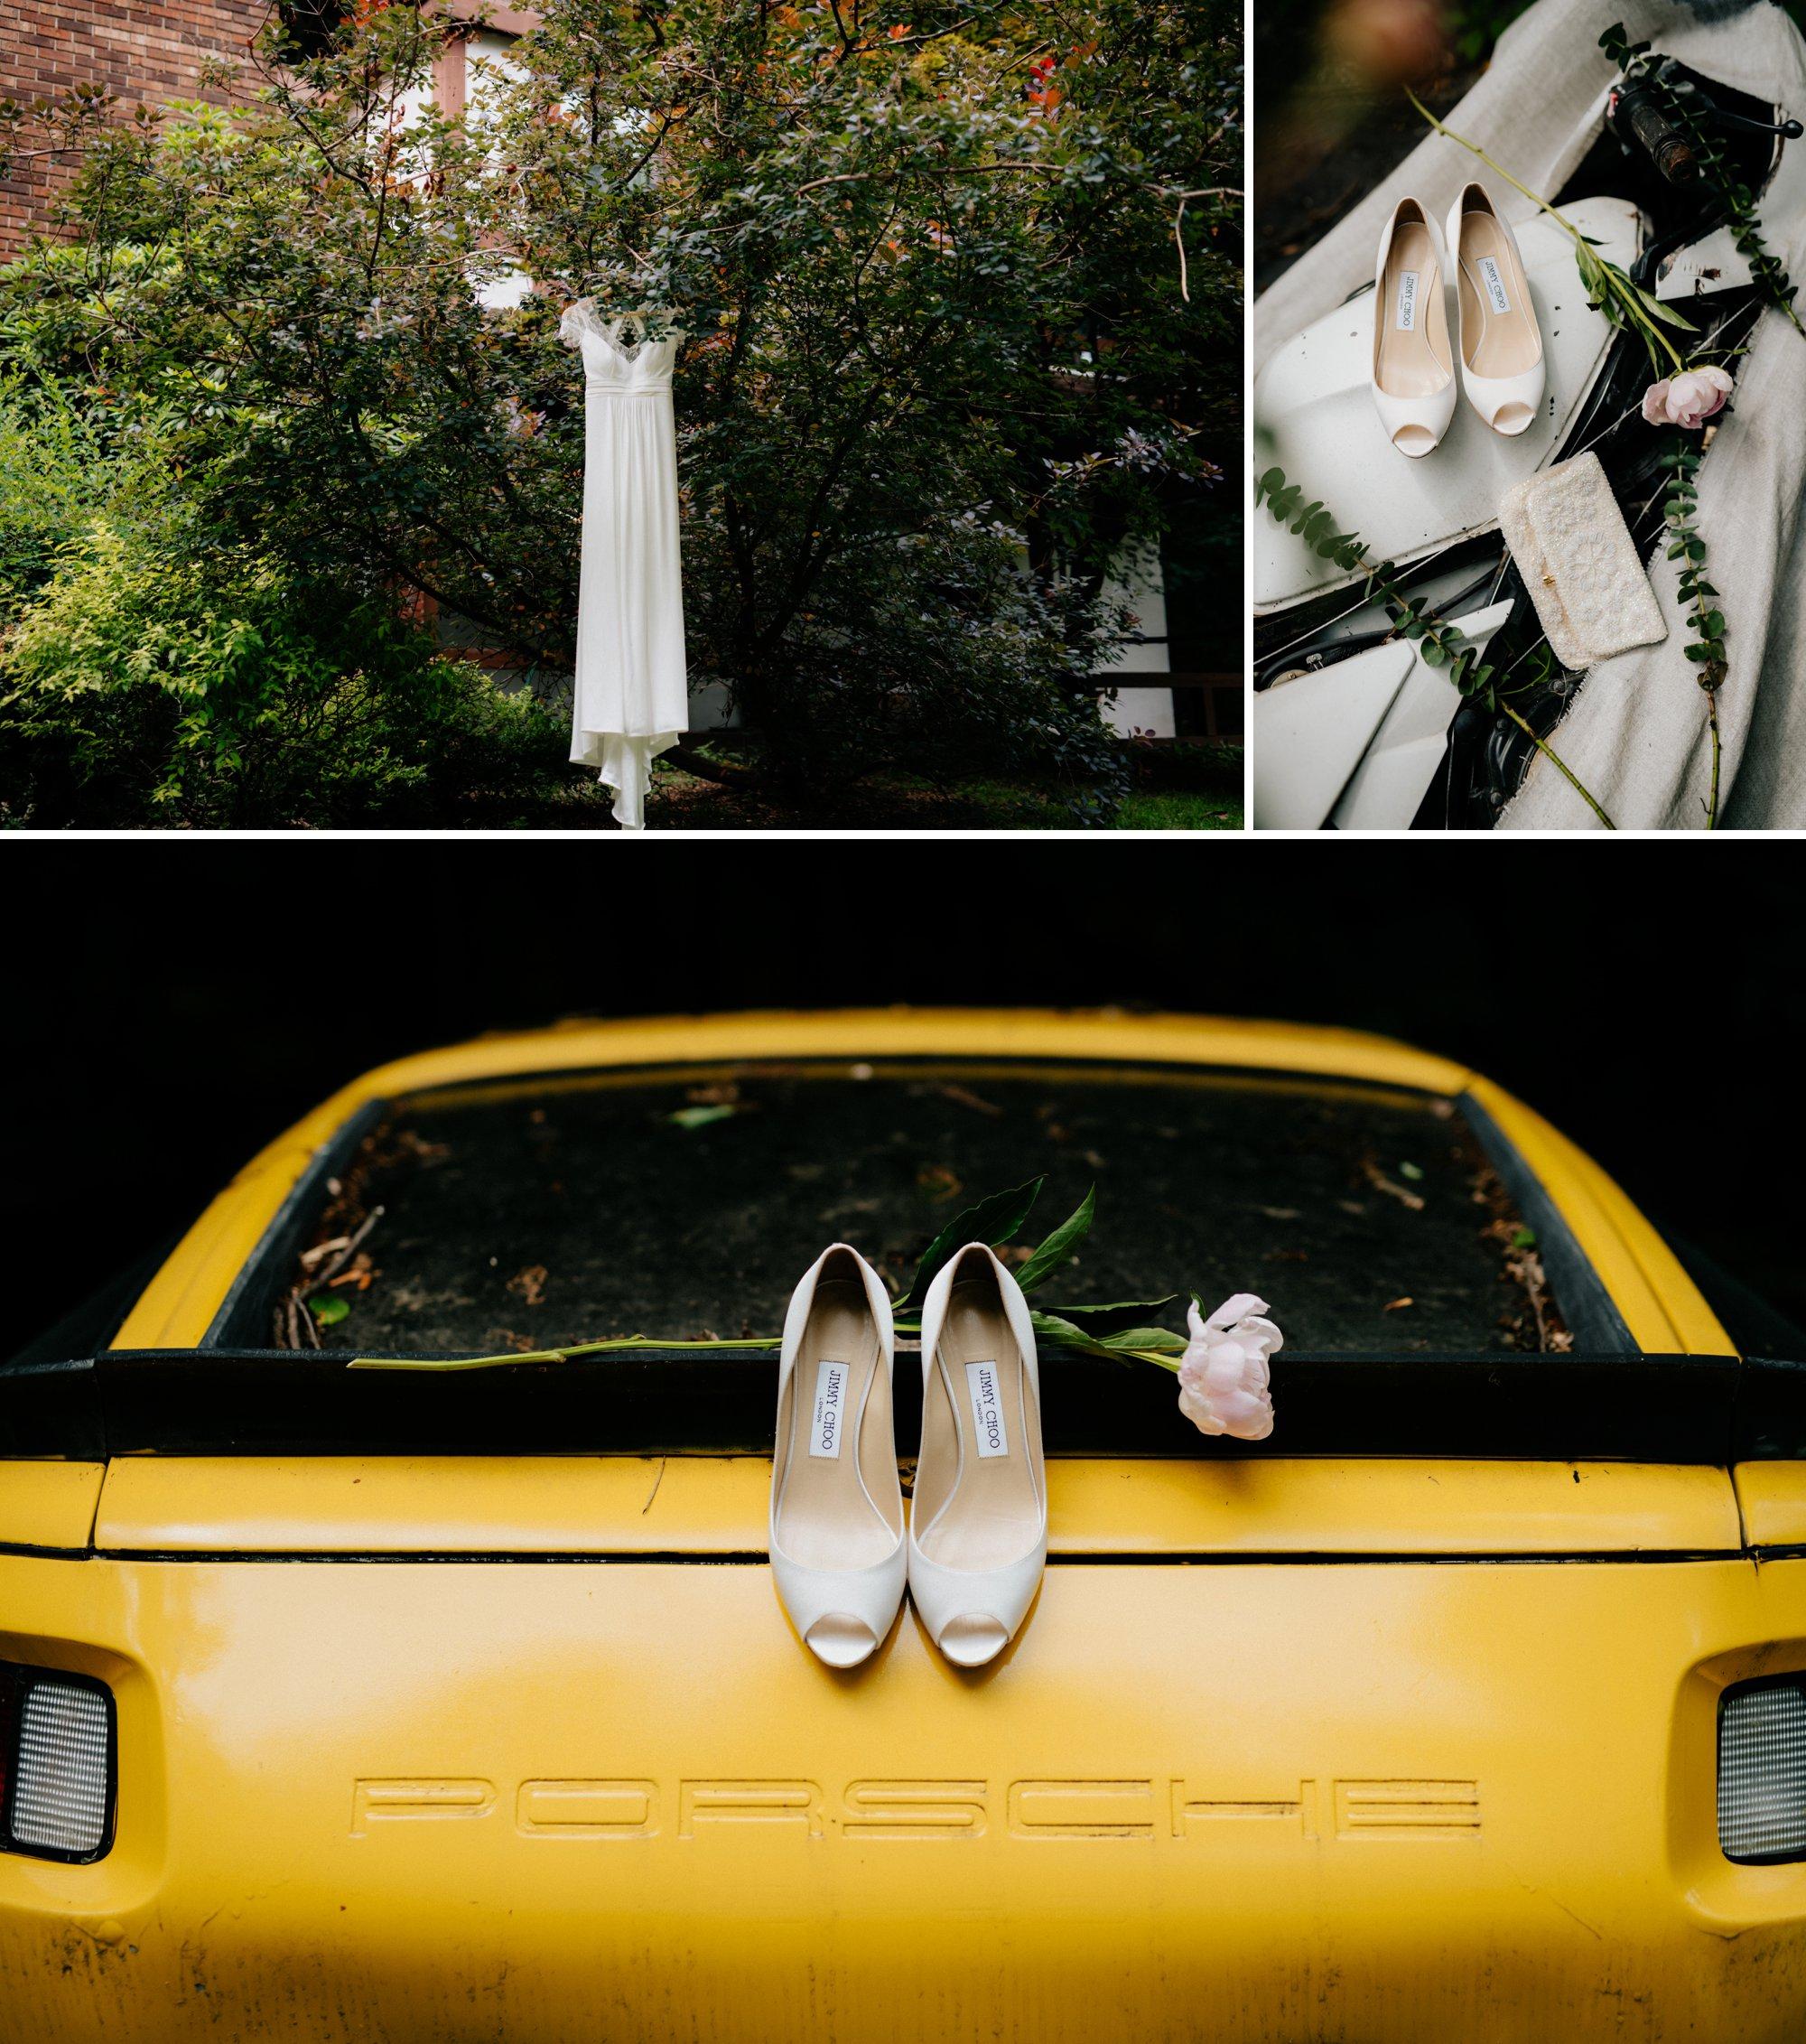 Philadelphia New Jersey Jockey Hollow Wedding Abandoned Athletic Courts Porche Jimmy Choos